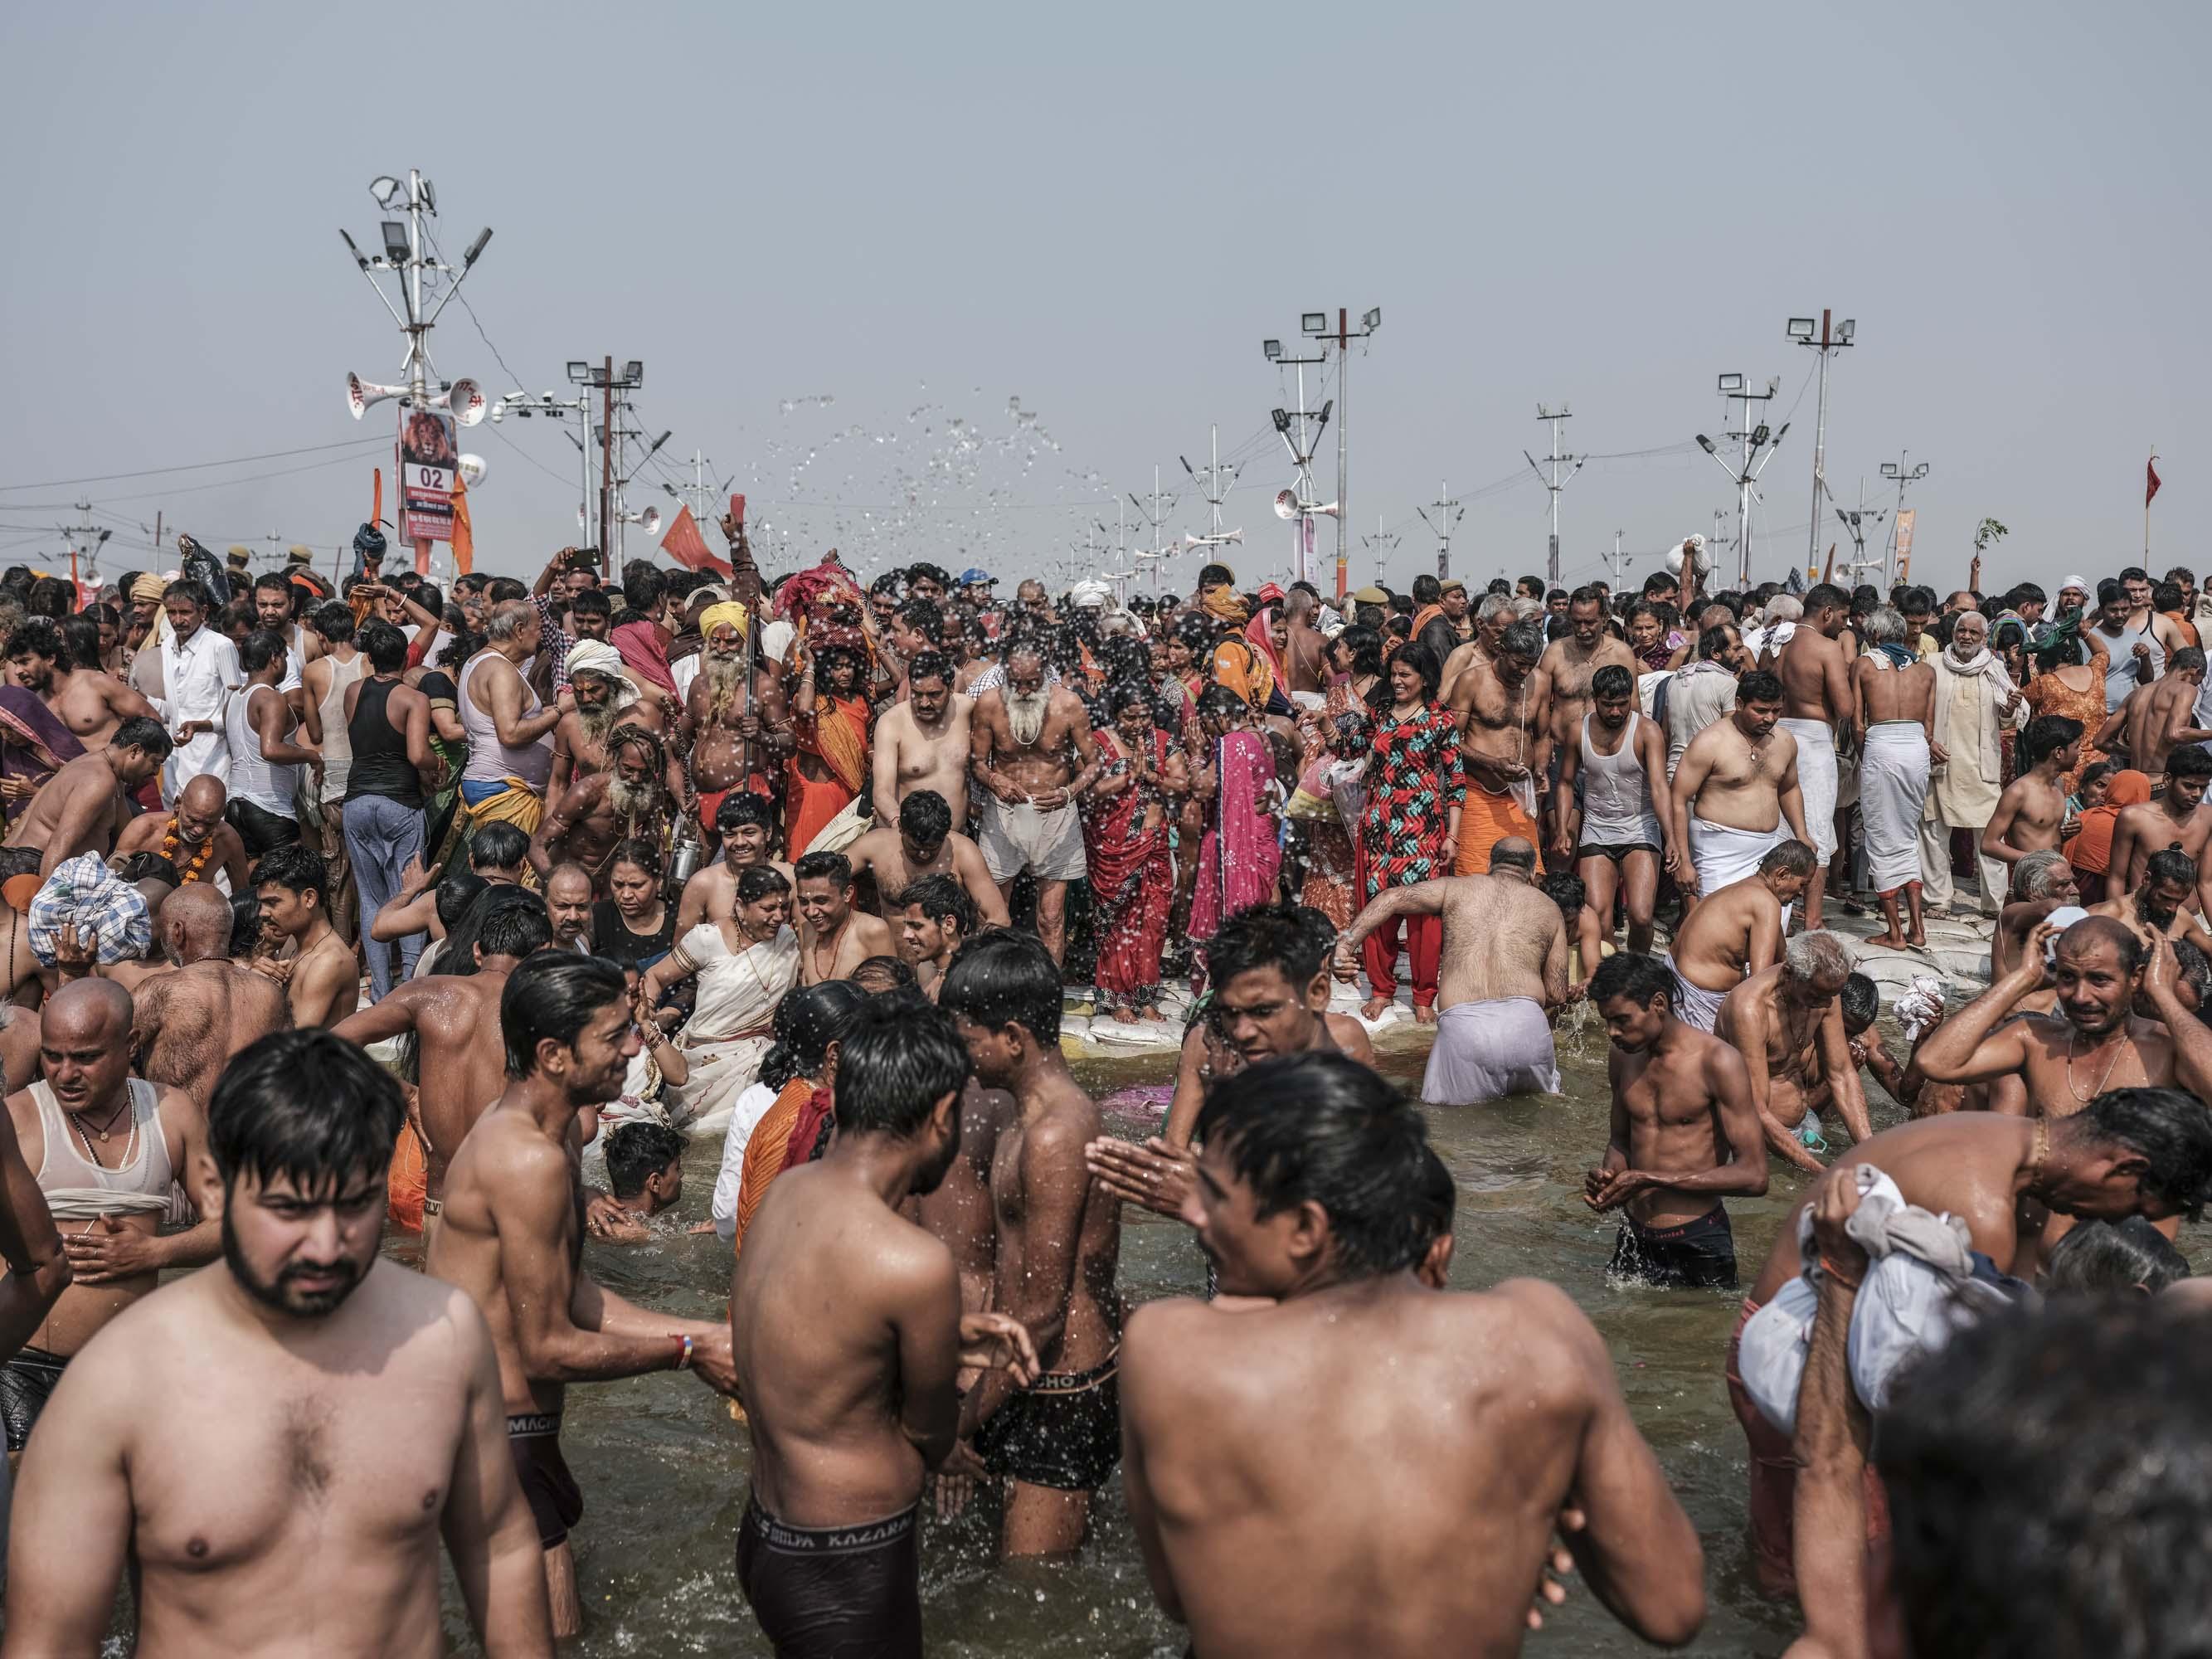 crowd water people pilgrims Kumbh mela 2019 India Allahabad Prayagraj Ardh hindu religious Festival event rivers photographer jose jeuland photography